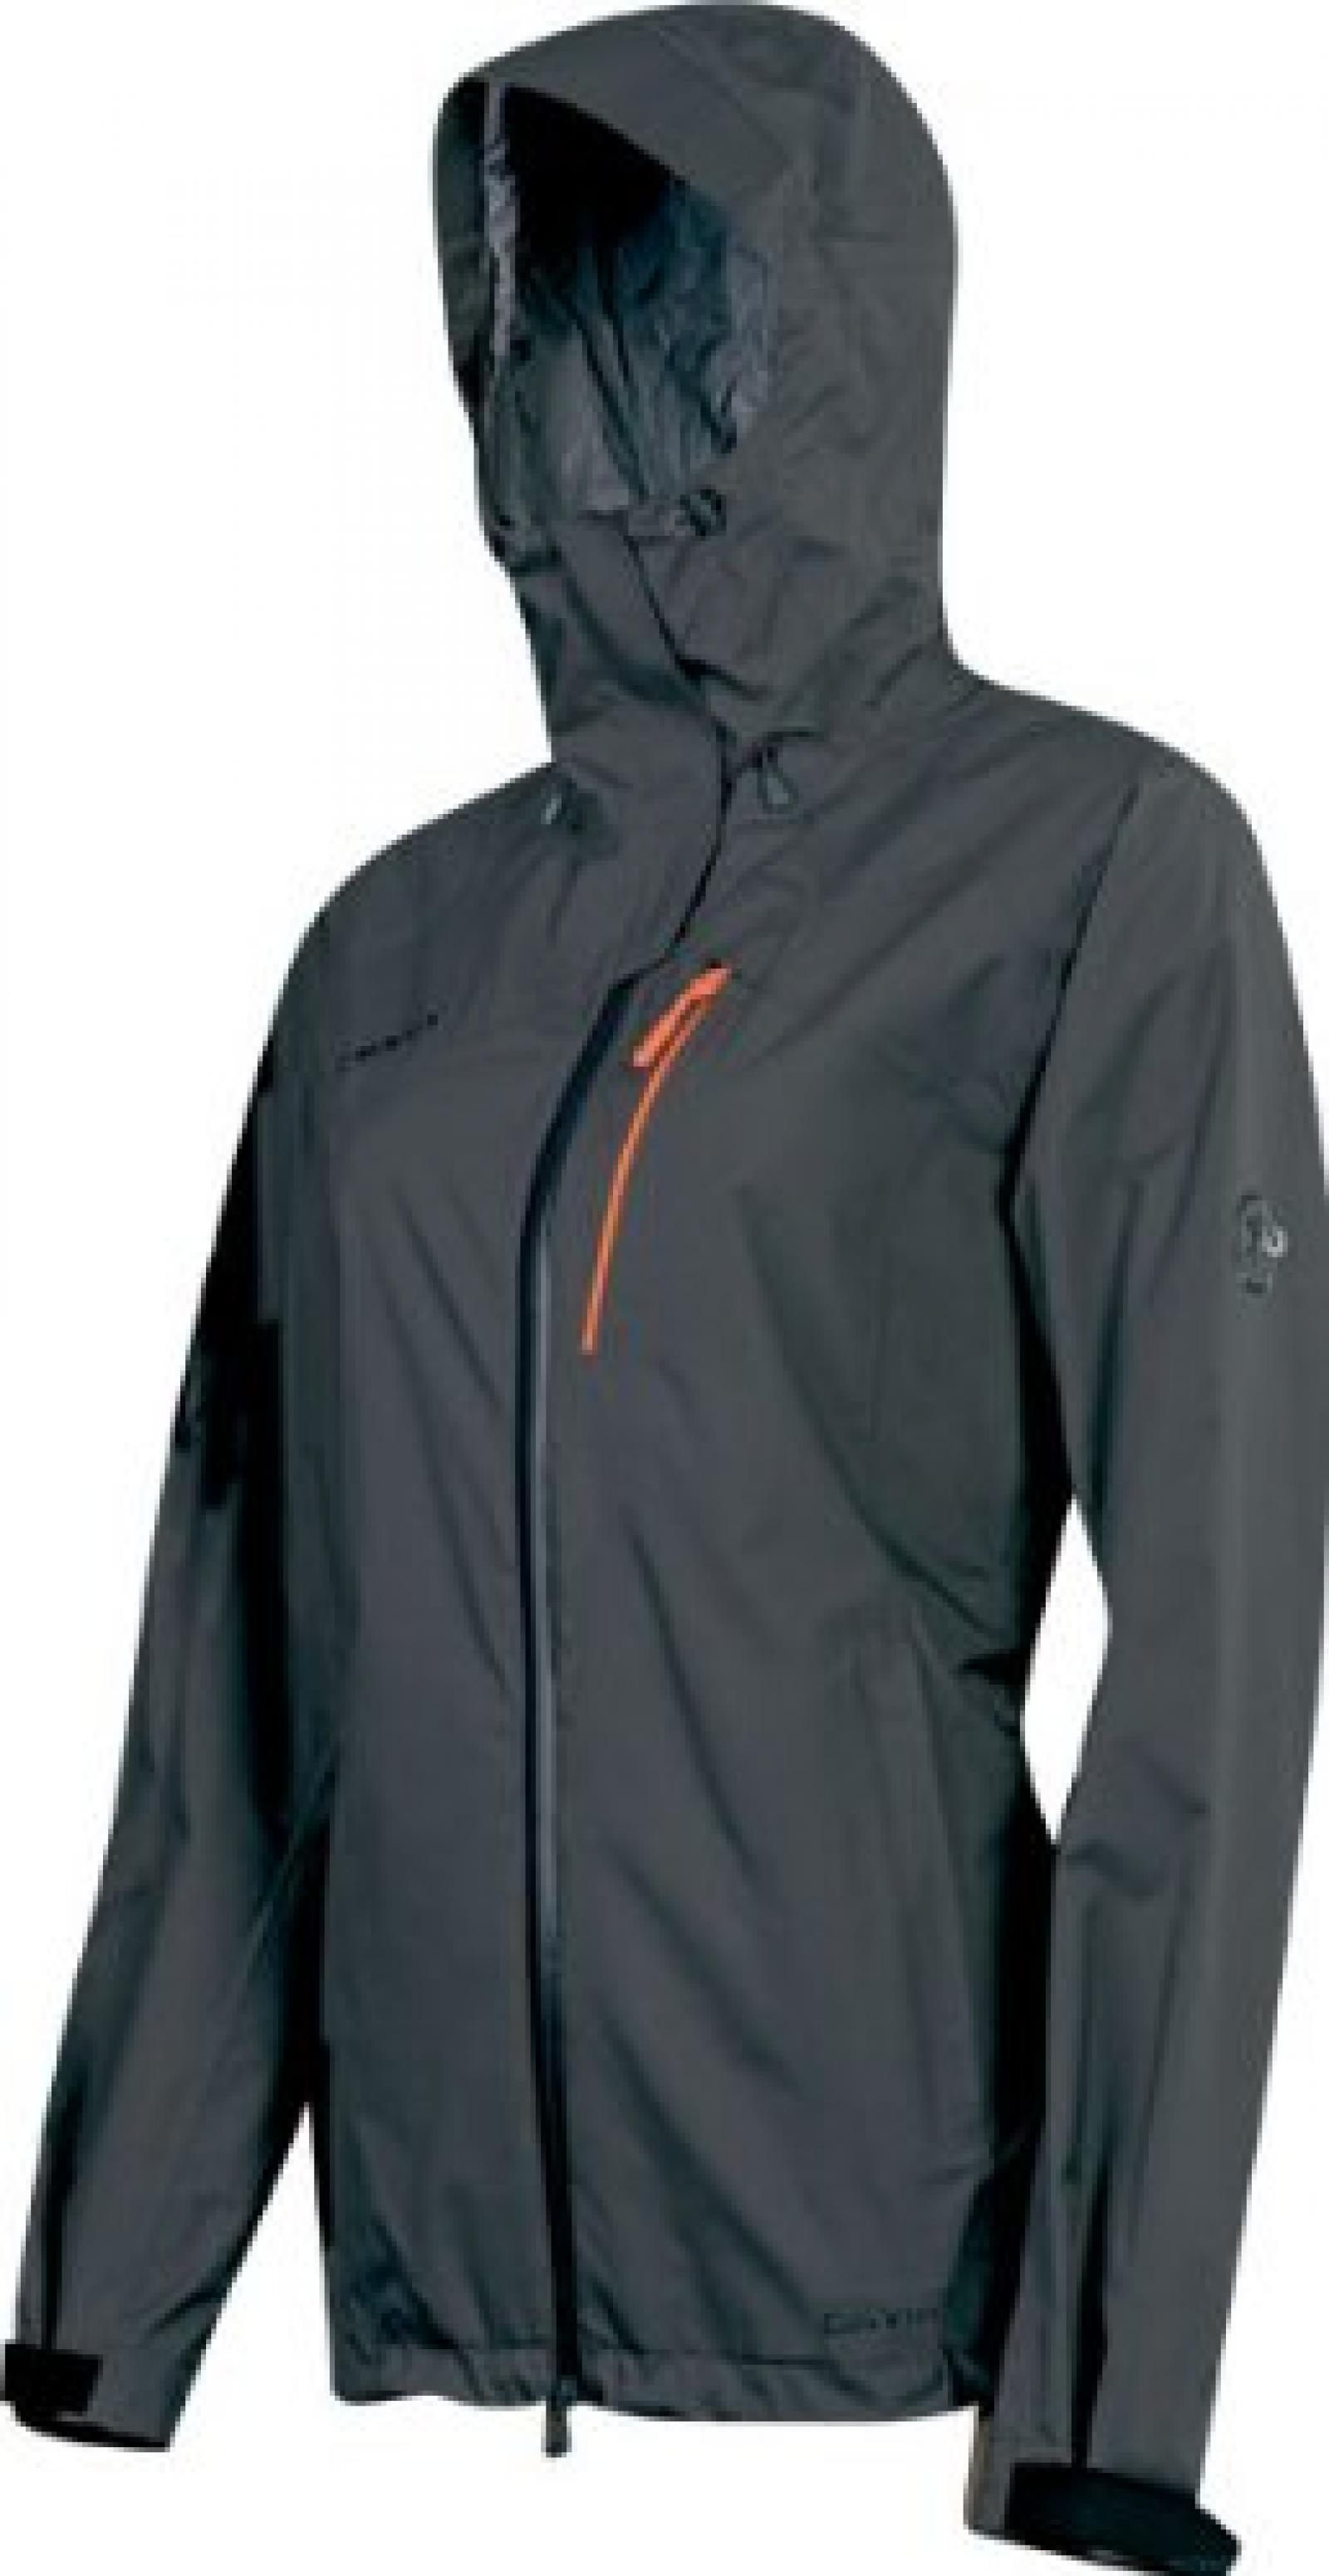 Mammut Crea Jacket Women - Bergsportjacke